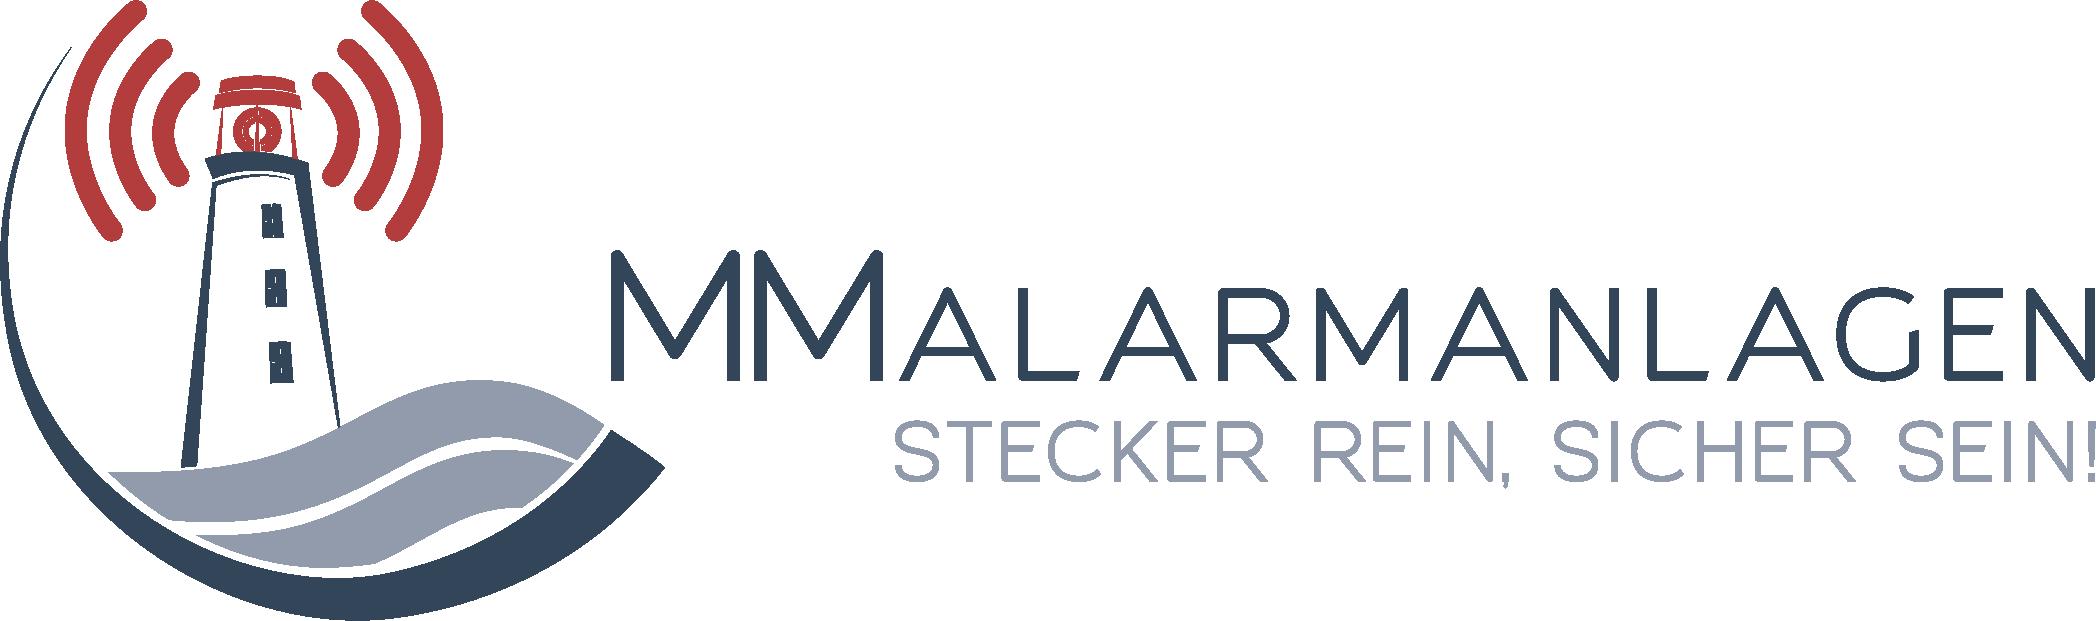 MM-Alarmanlagen